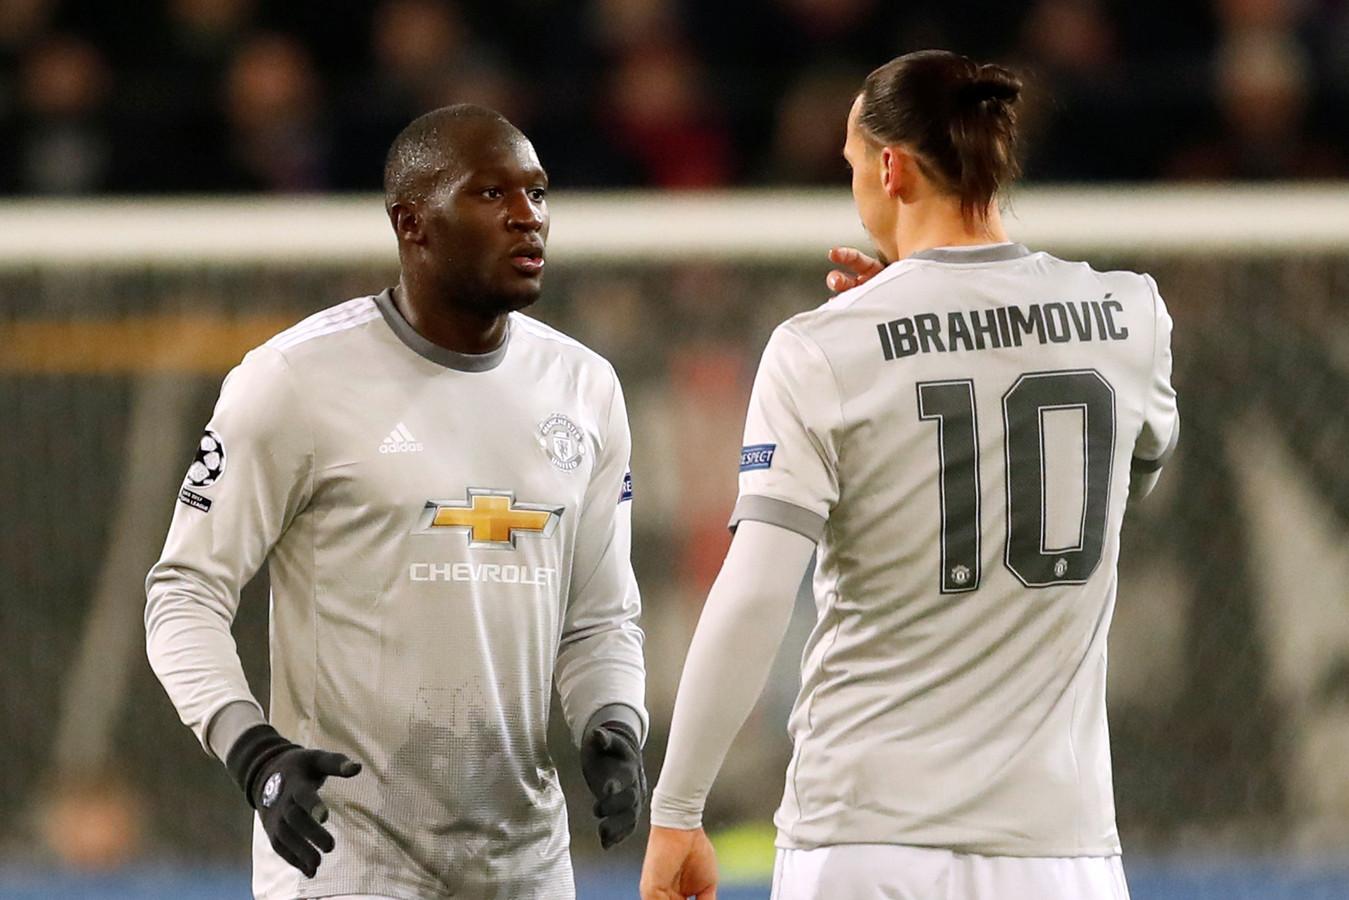 Lukaku et Ibrahimovic ont joué ensemble à Man Utd